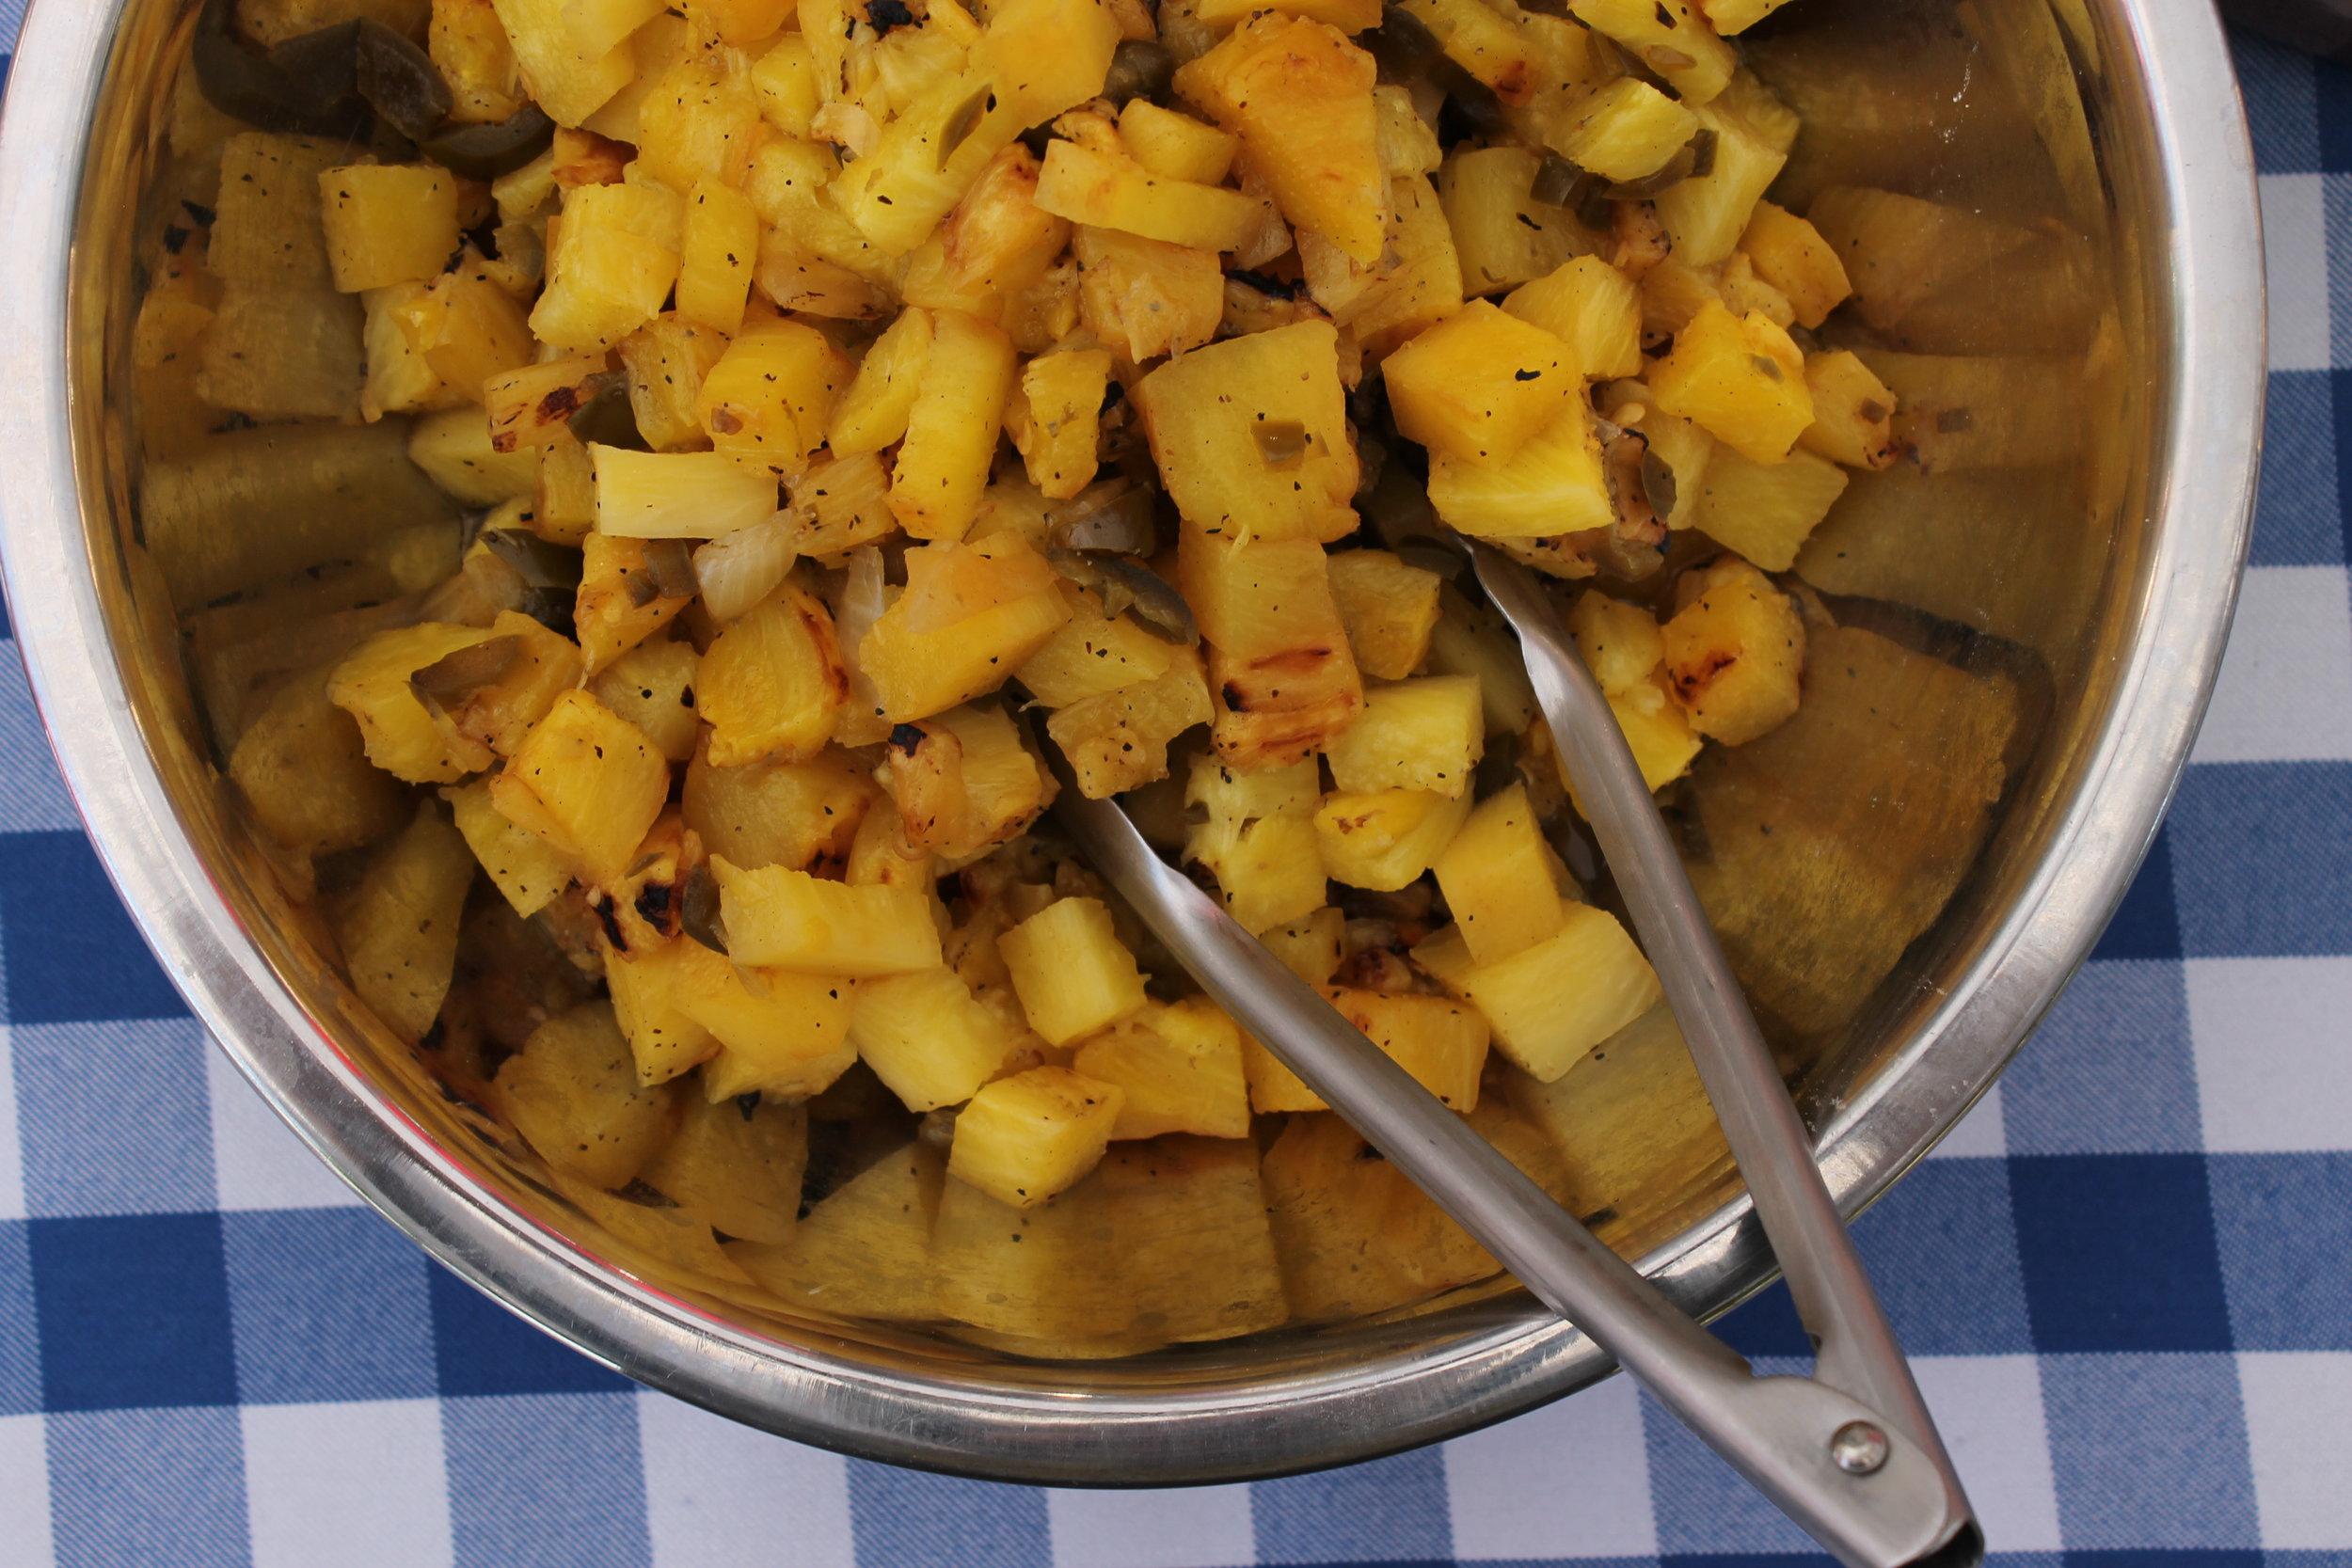 Roasted pinapple and jalapeno salsa